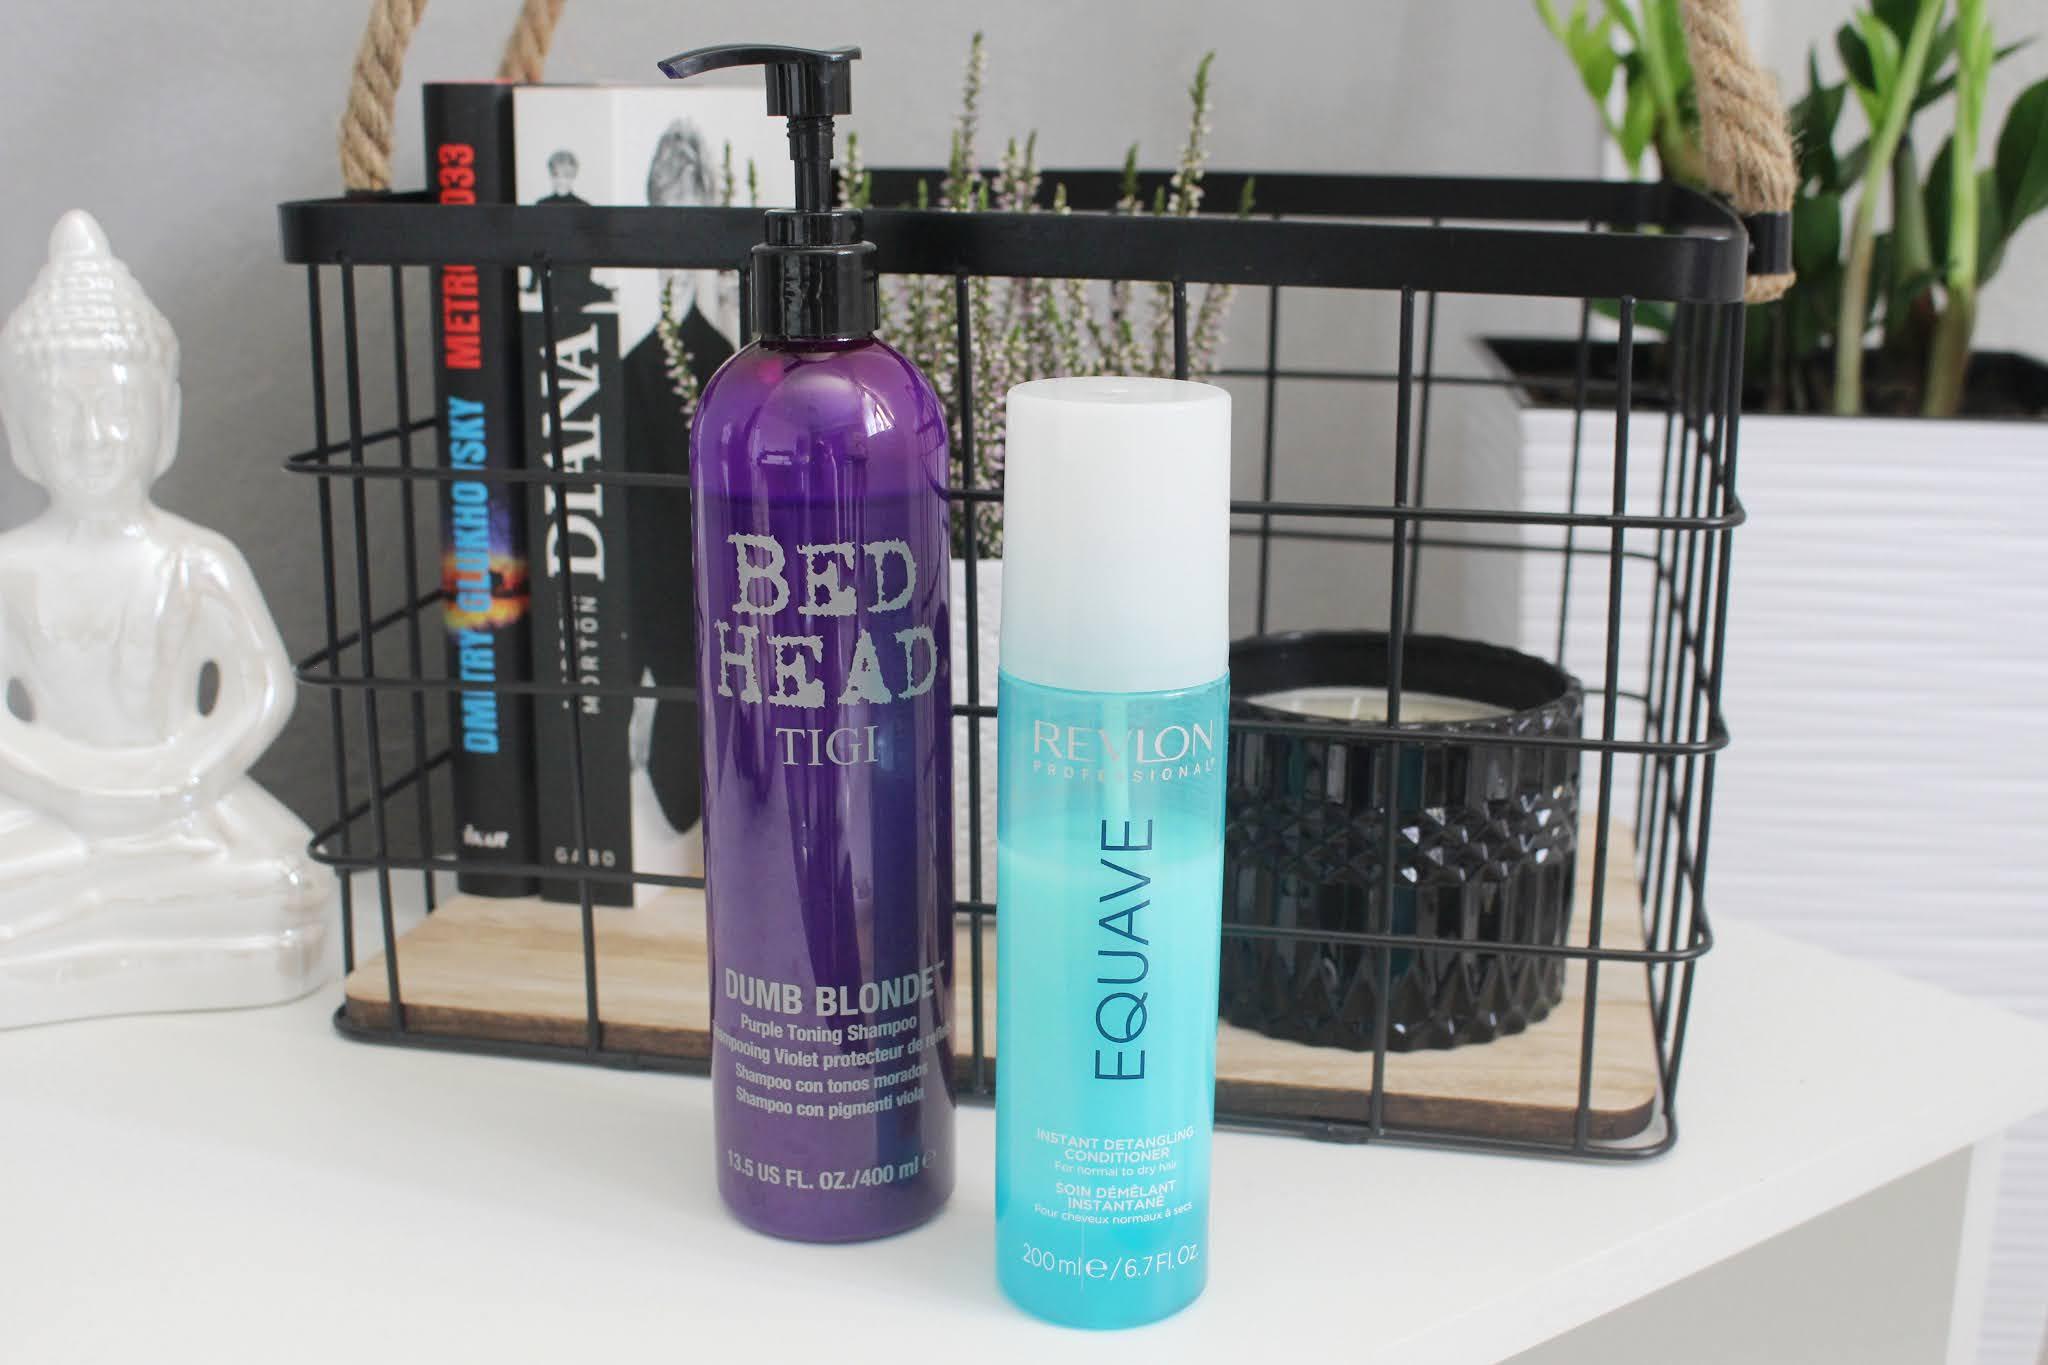 vlasová kozmetika, Notino, recenzia, blog, Revlon, Tigi, shampoo